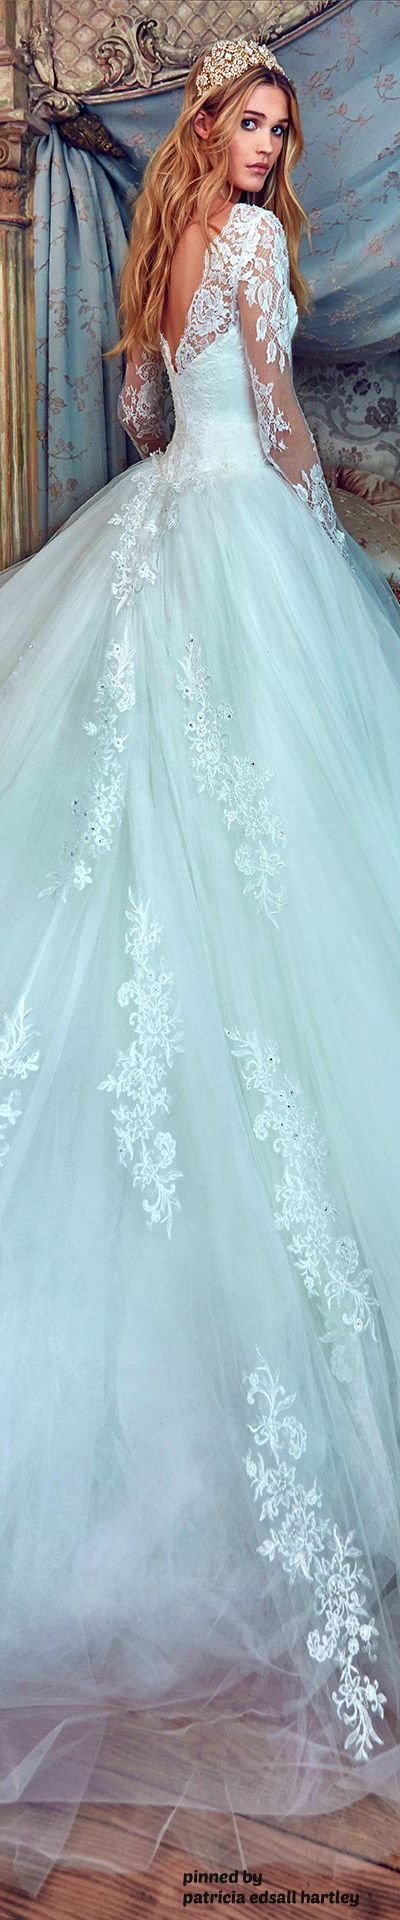 09a7626f83a3b beautiful dresses princesses 15 best outfits - beautiful dresses